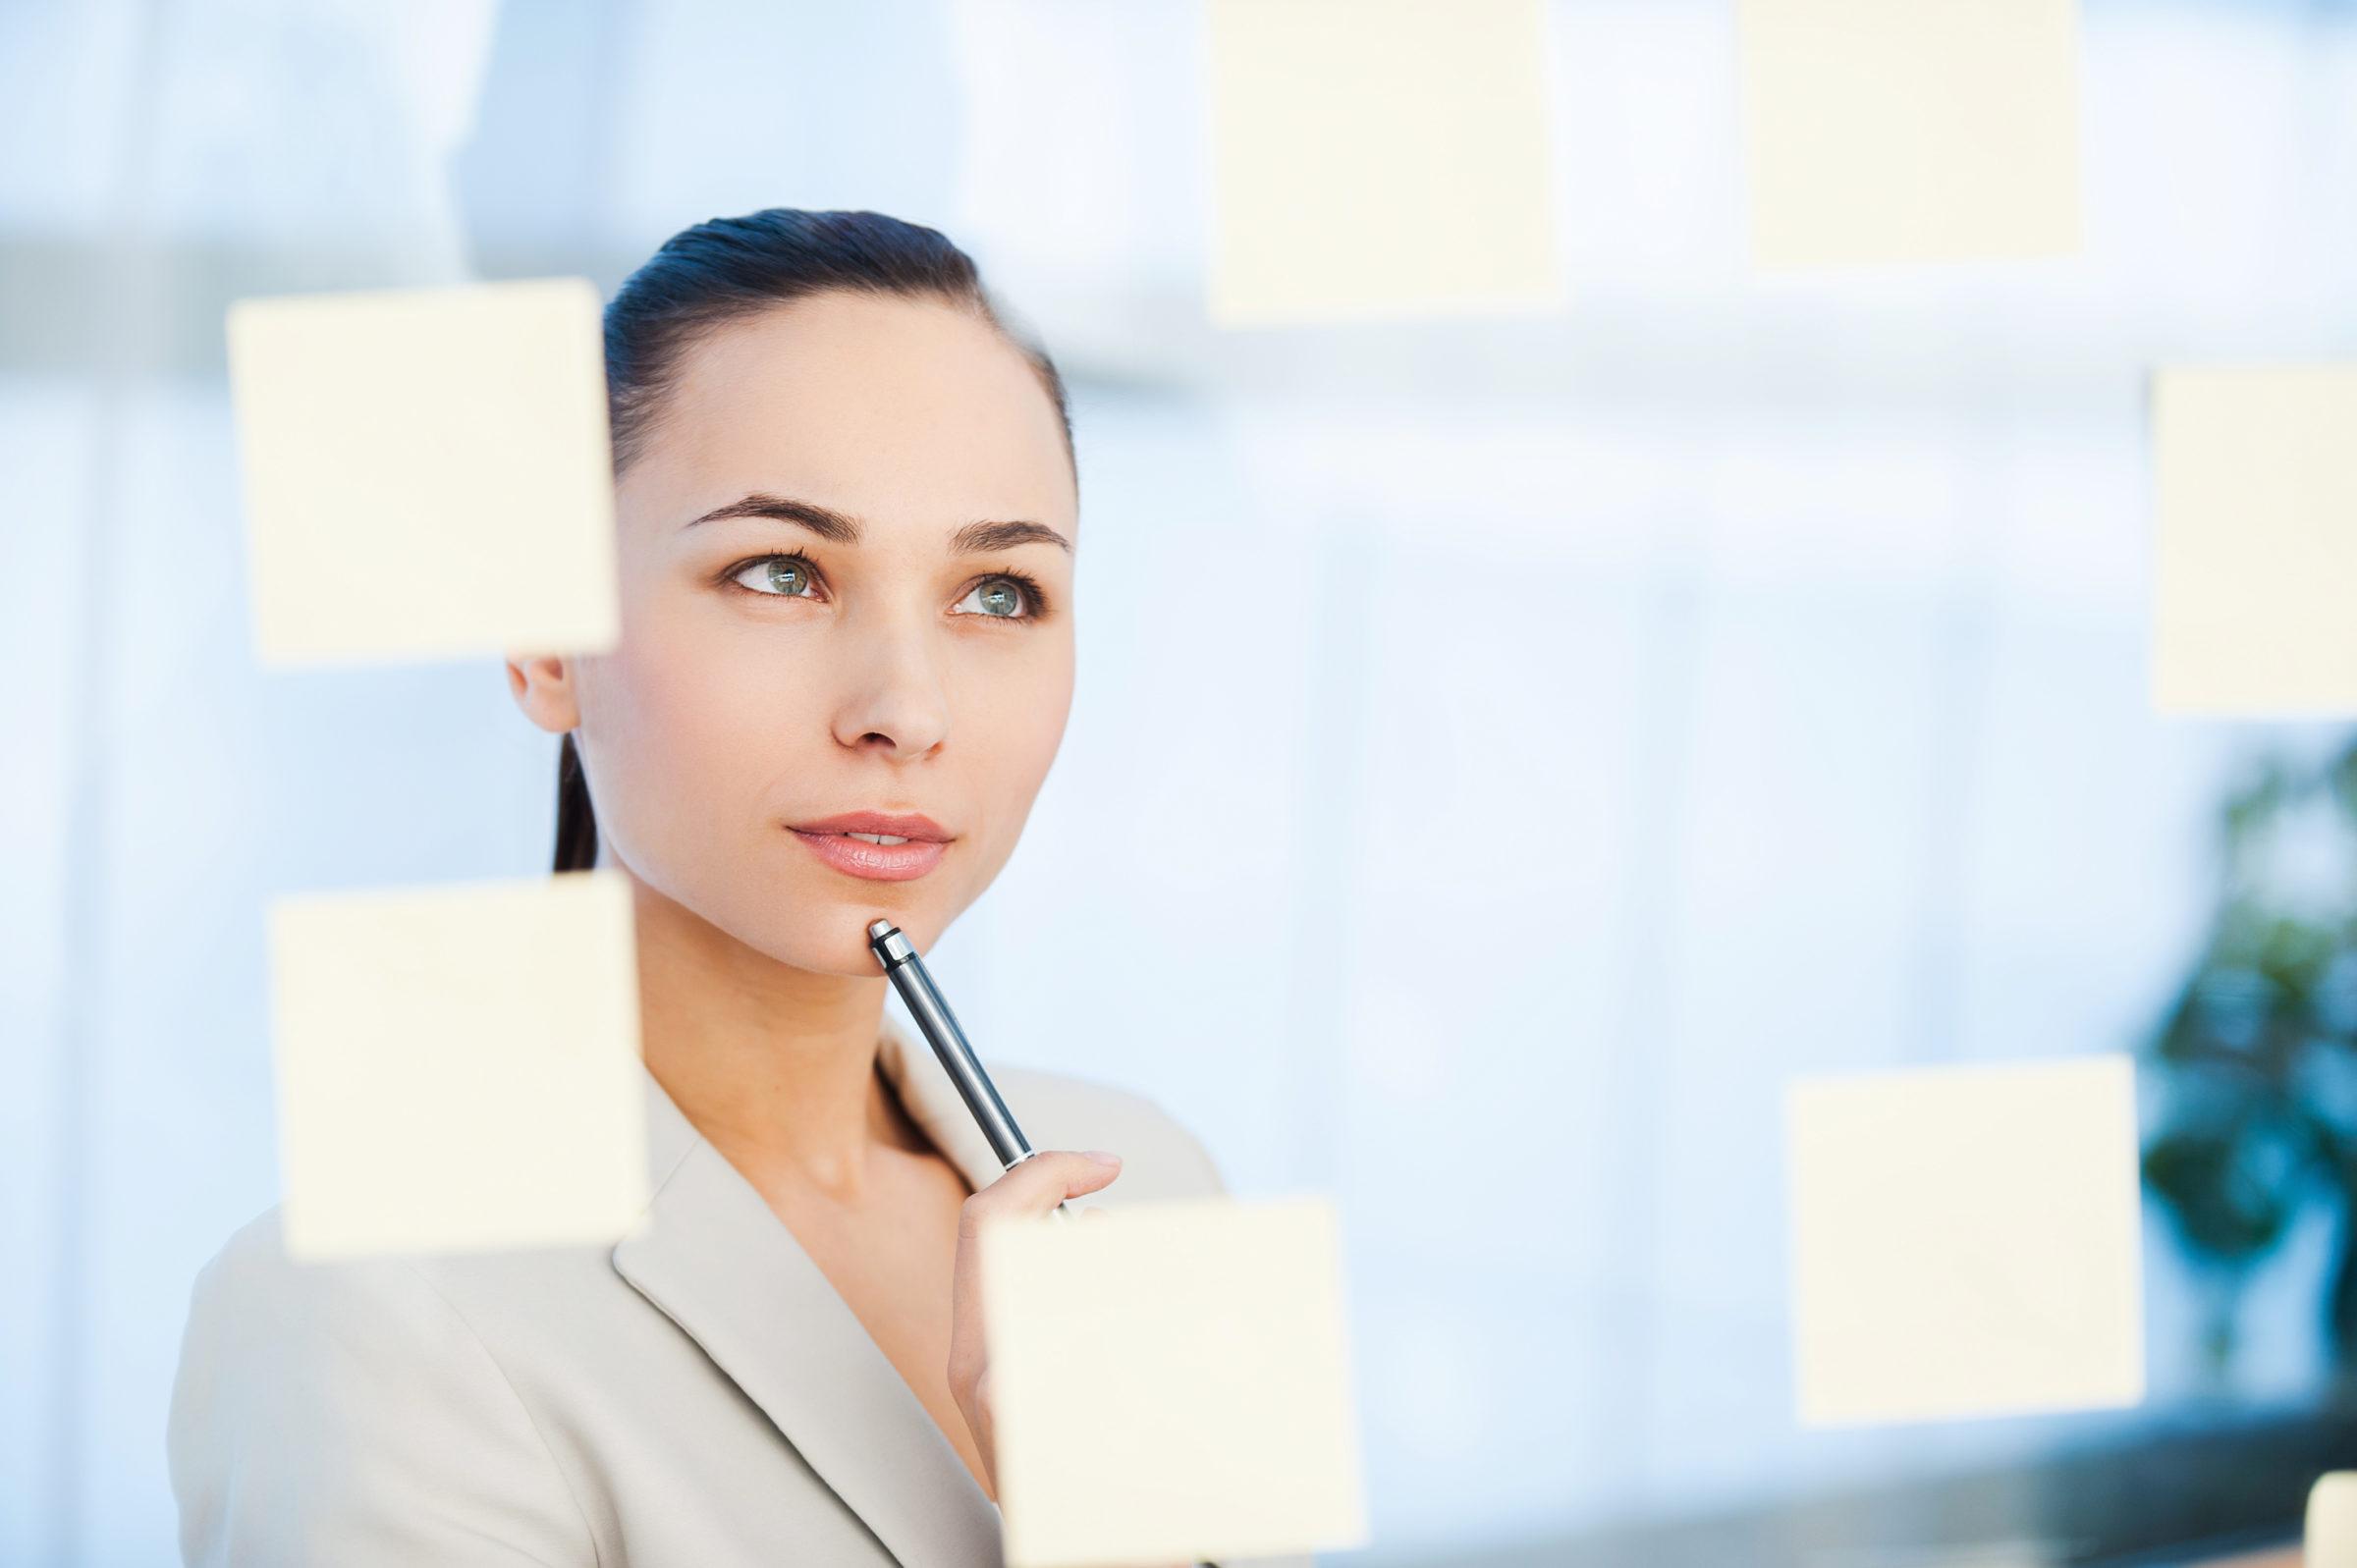 planning business strategy 98RRTNB